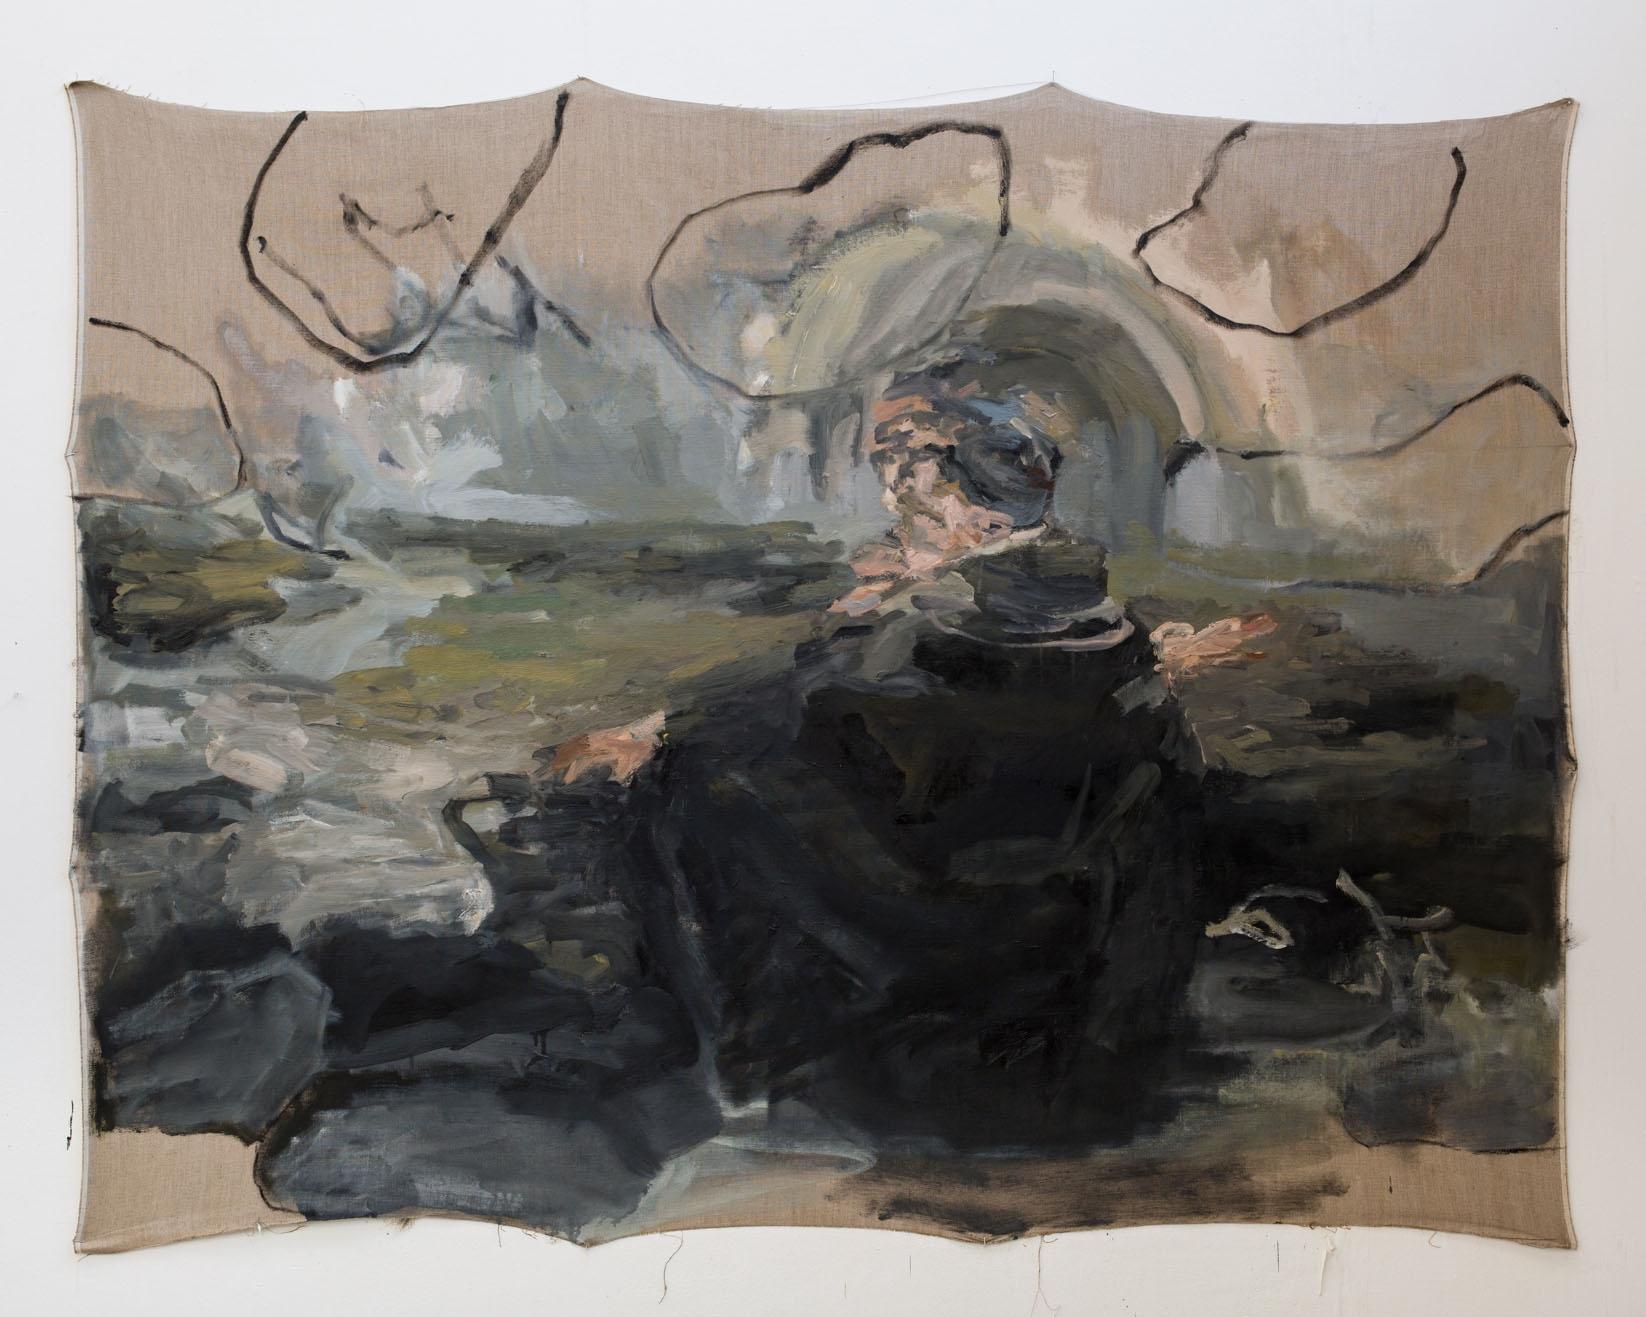 "Campfire I,  Oil on Linen, 60x 72"", 2016"